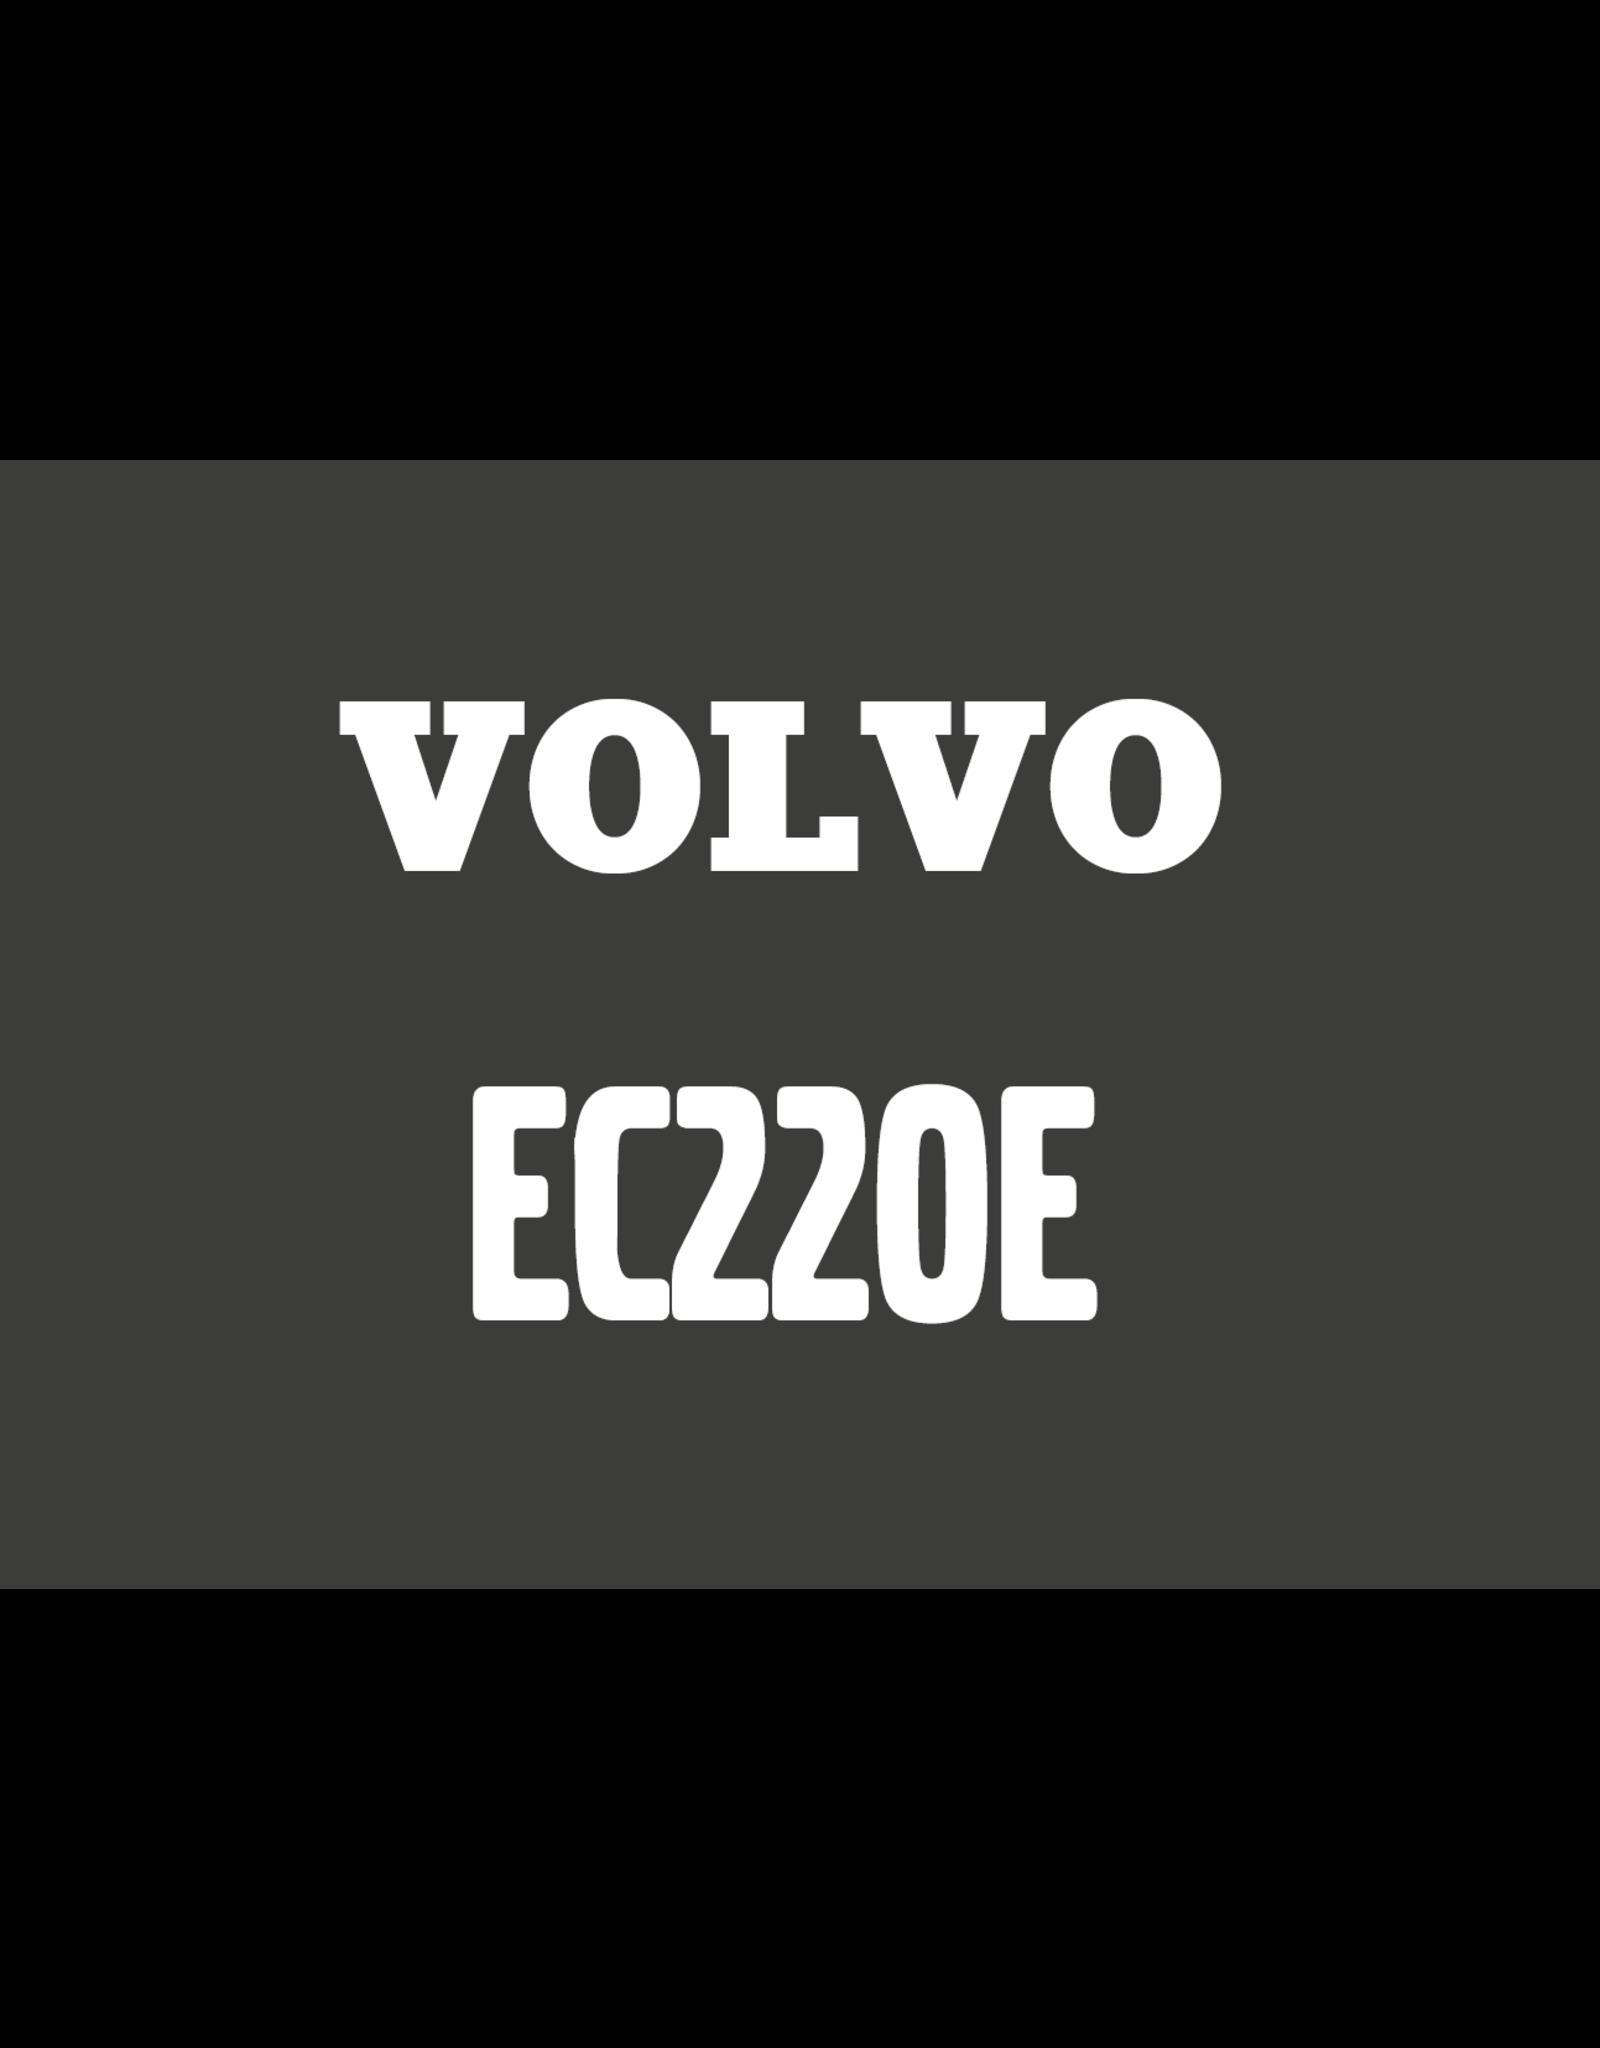 Echle Hartstahl GmbH FOPS für Volvo EC220E